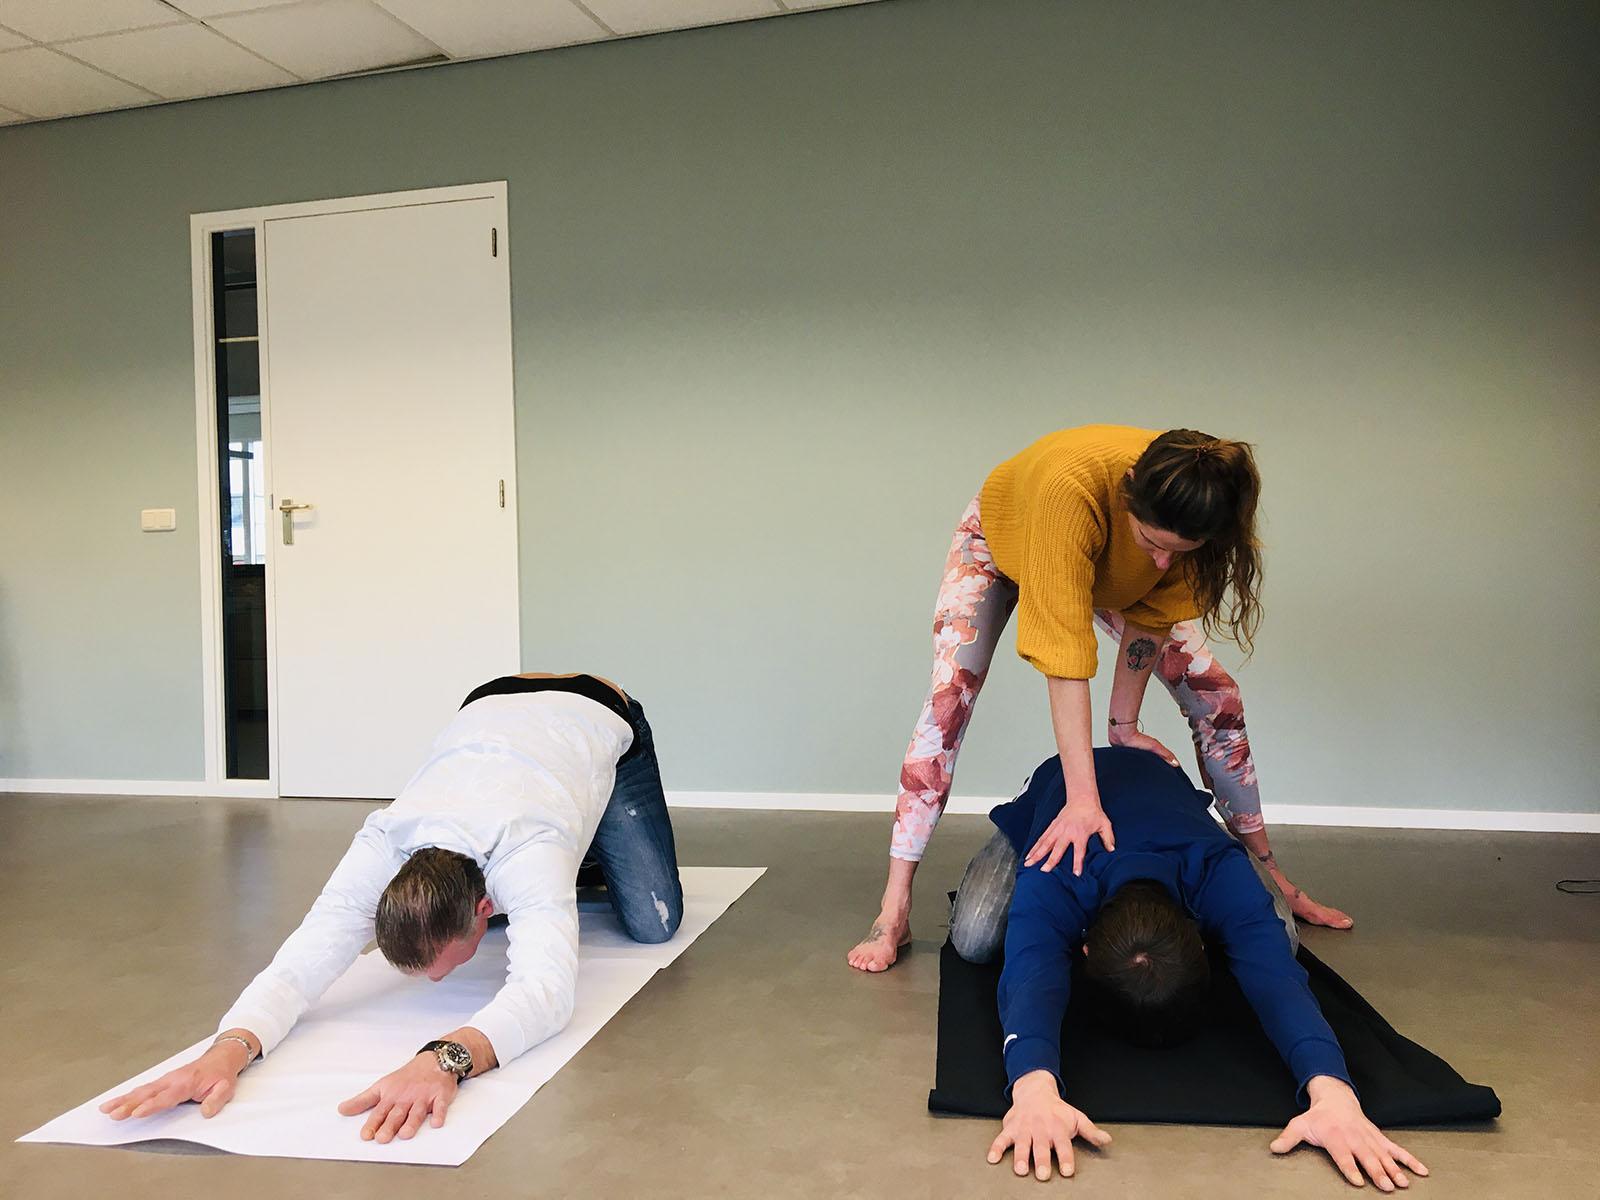 Yoga-leeuwarden_prive-yoga-leeuwarden_yoga-met-joska_individuele-yogales_1op1yoga-leeuwarden_yoga-aan-huis